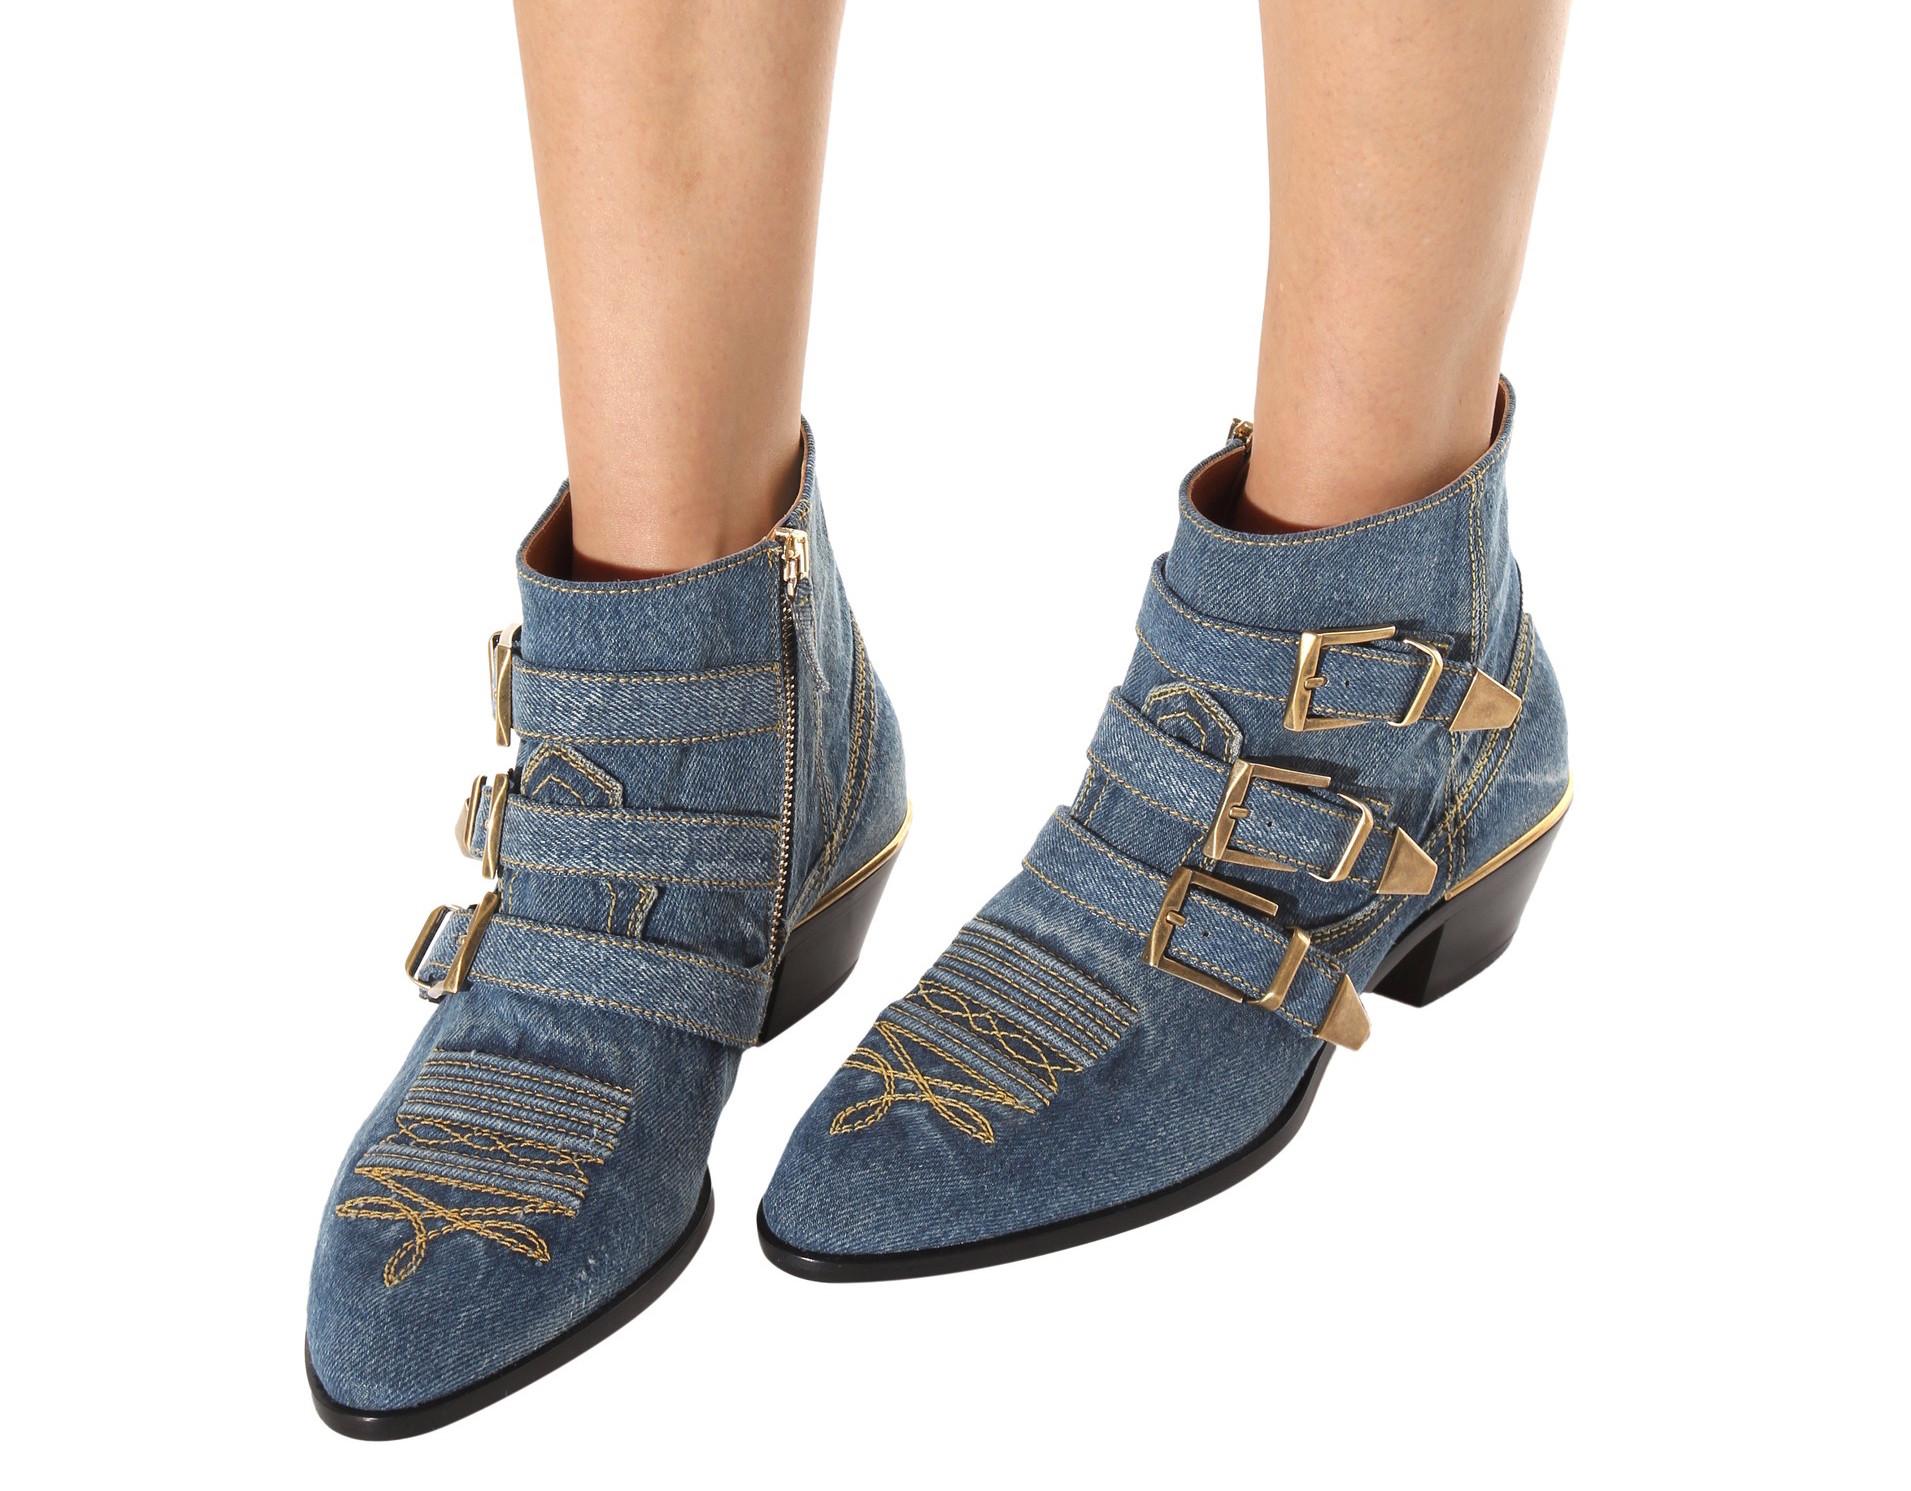 chloe-kris-denim-ankle-boots-2